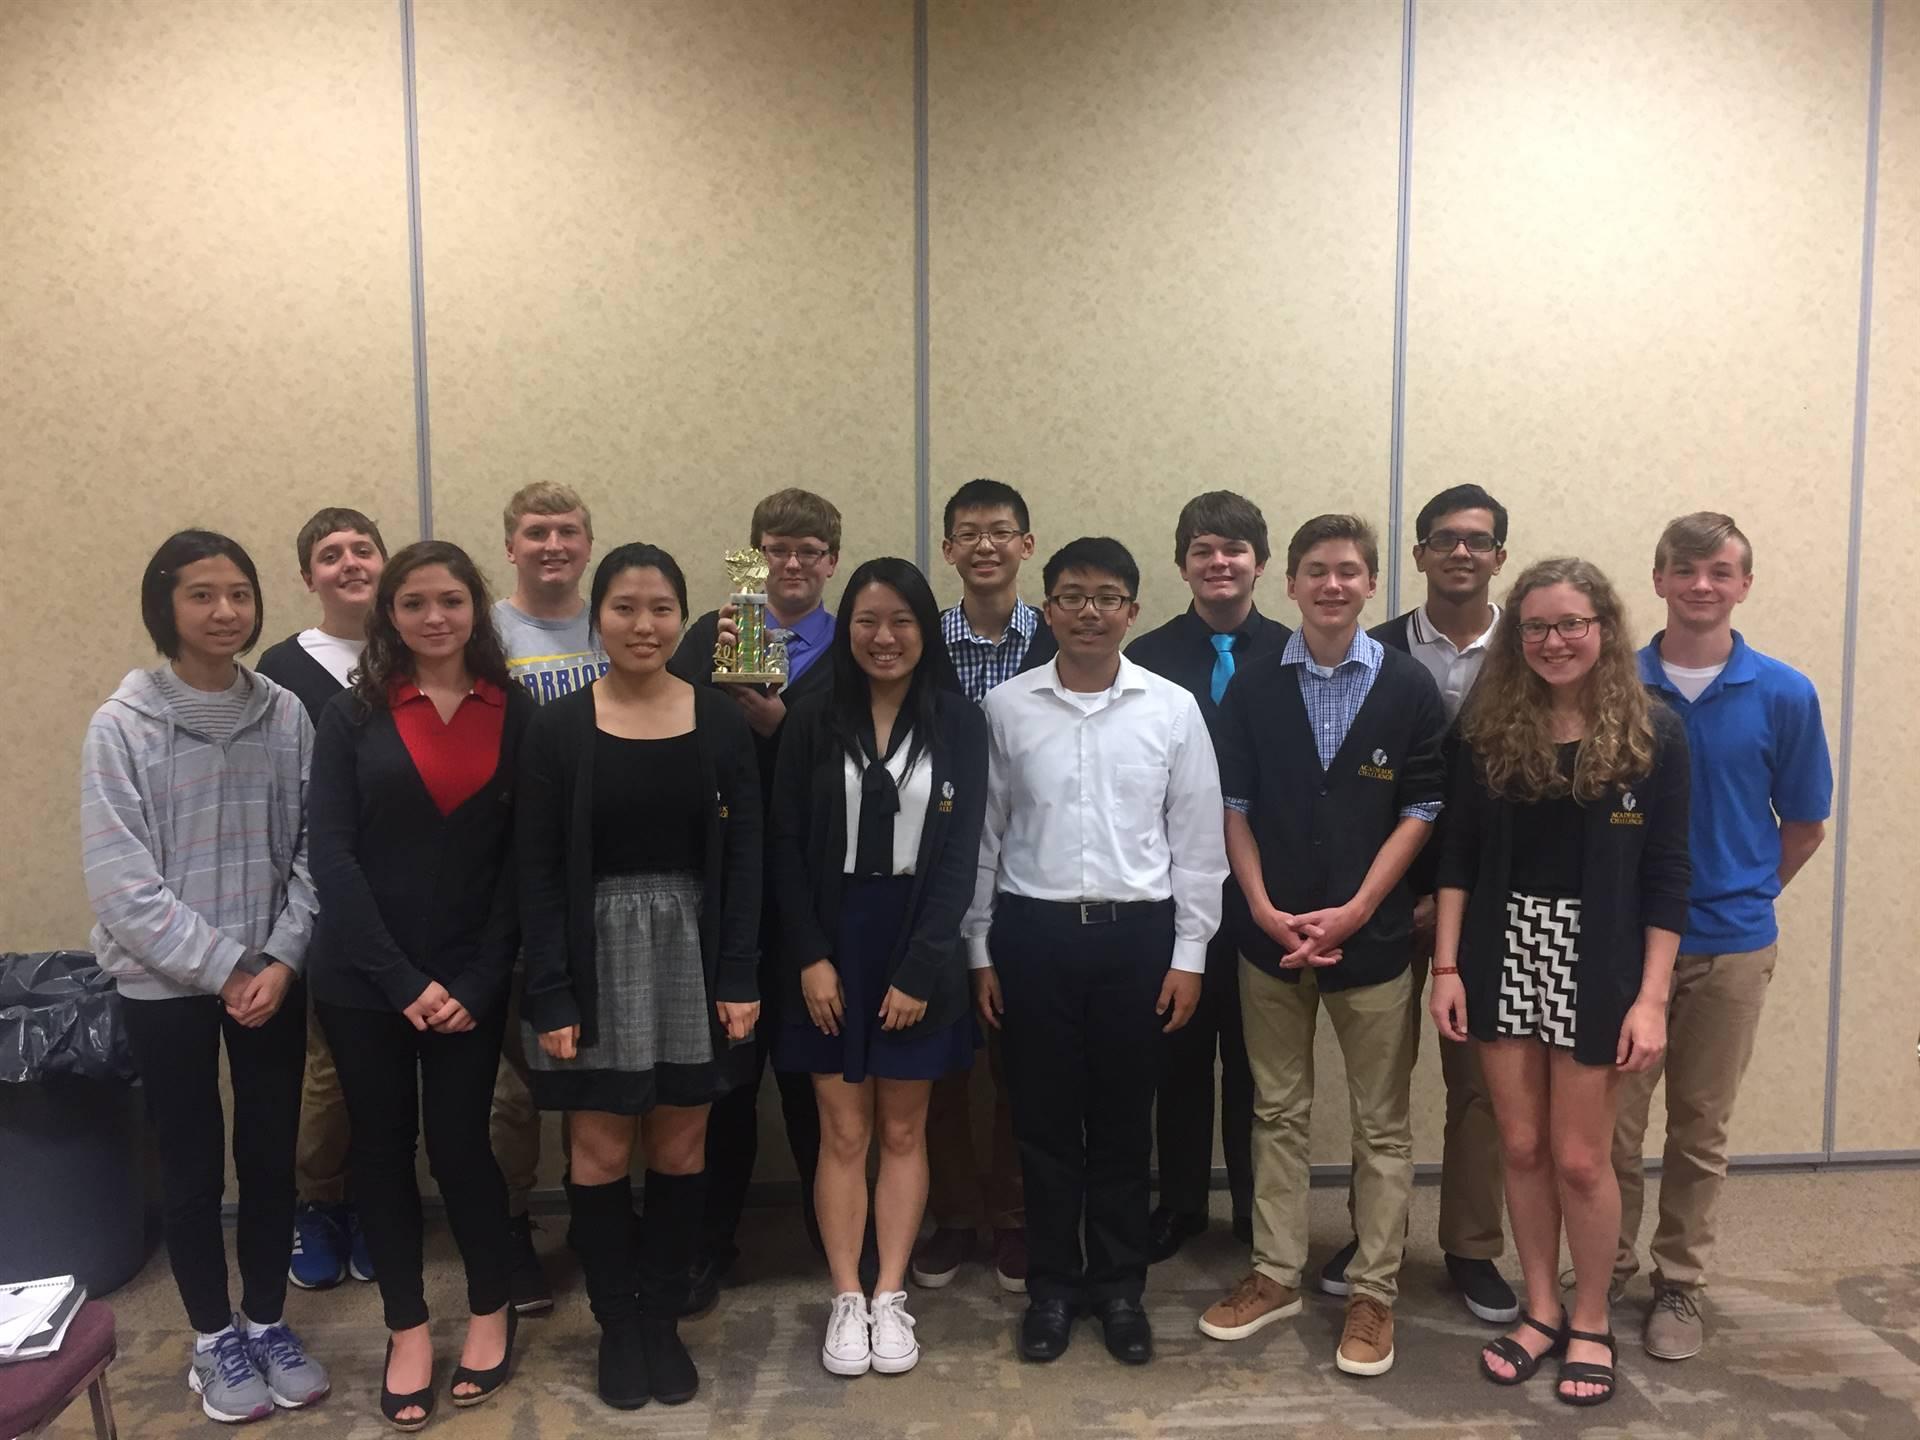 photo of the Academic Challenge Team